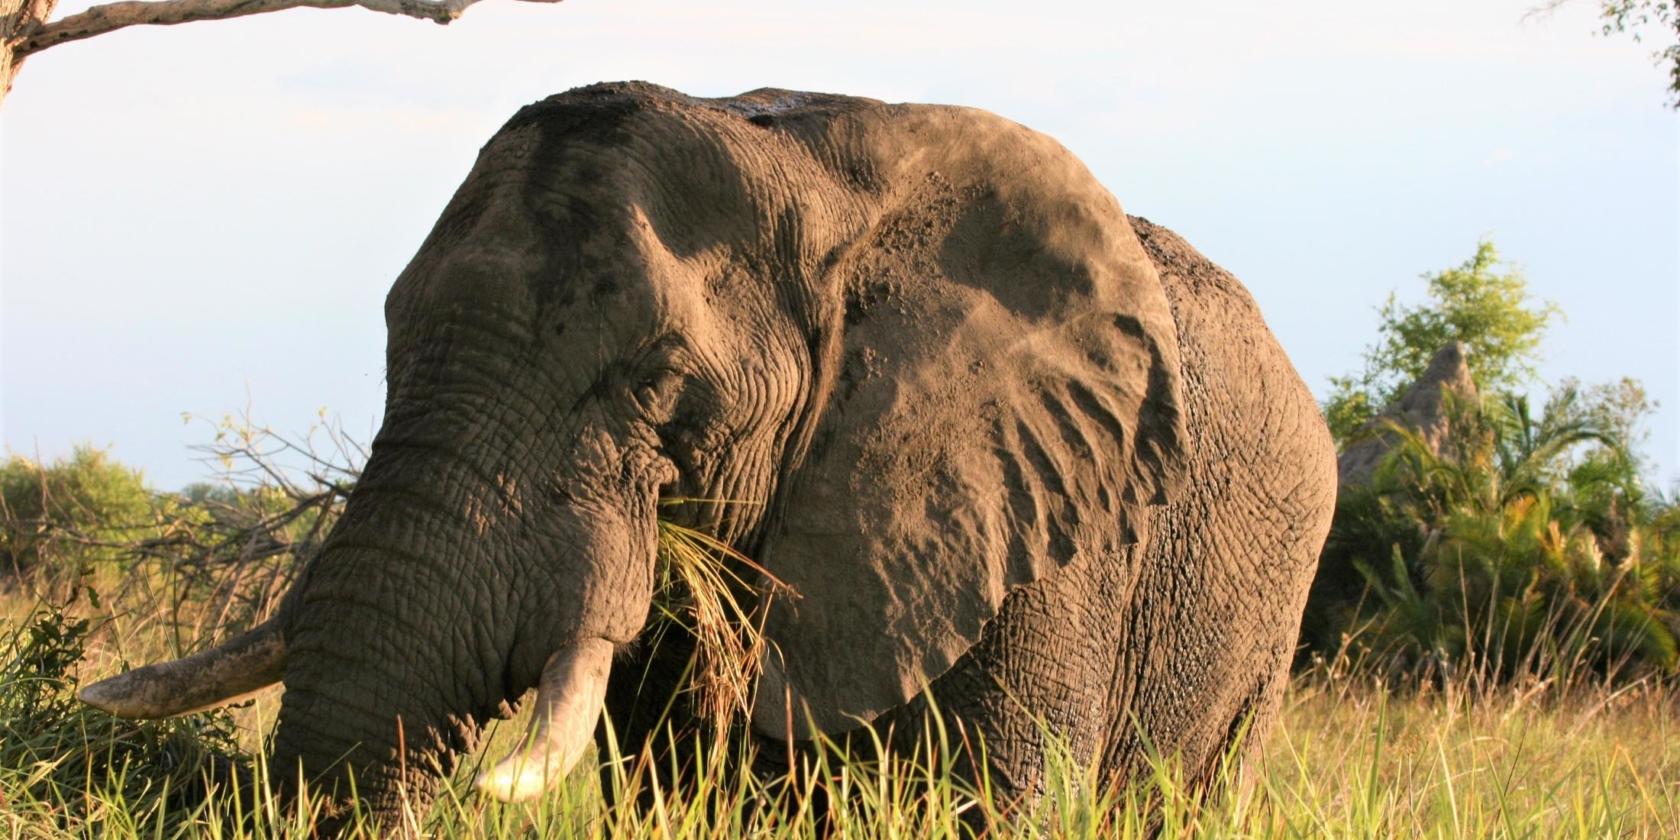 Okavango Delta - Olifant close-up